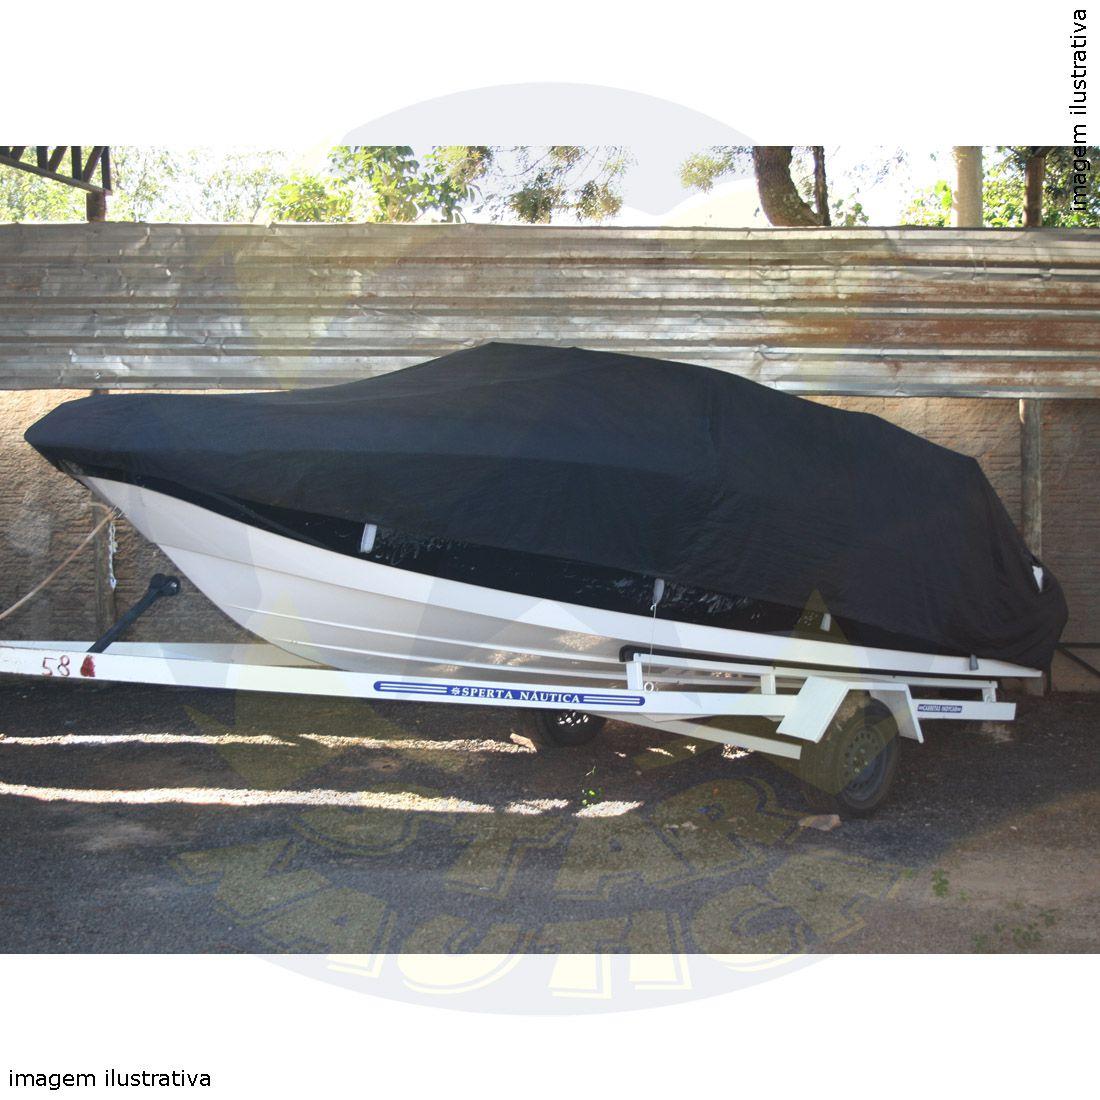 Capa Lona de Cobertura Lancha FS 230 Sirena ou Scapare Lona Poliéster